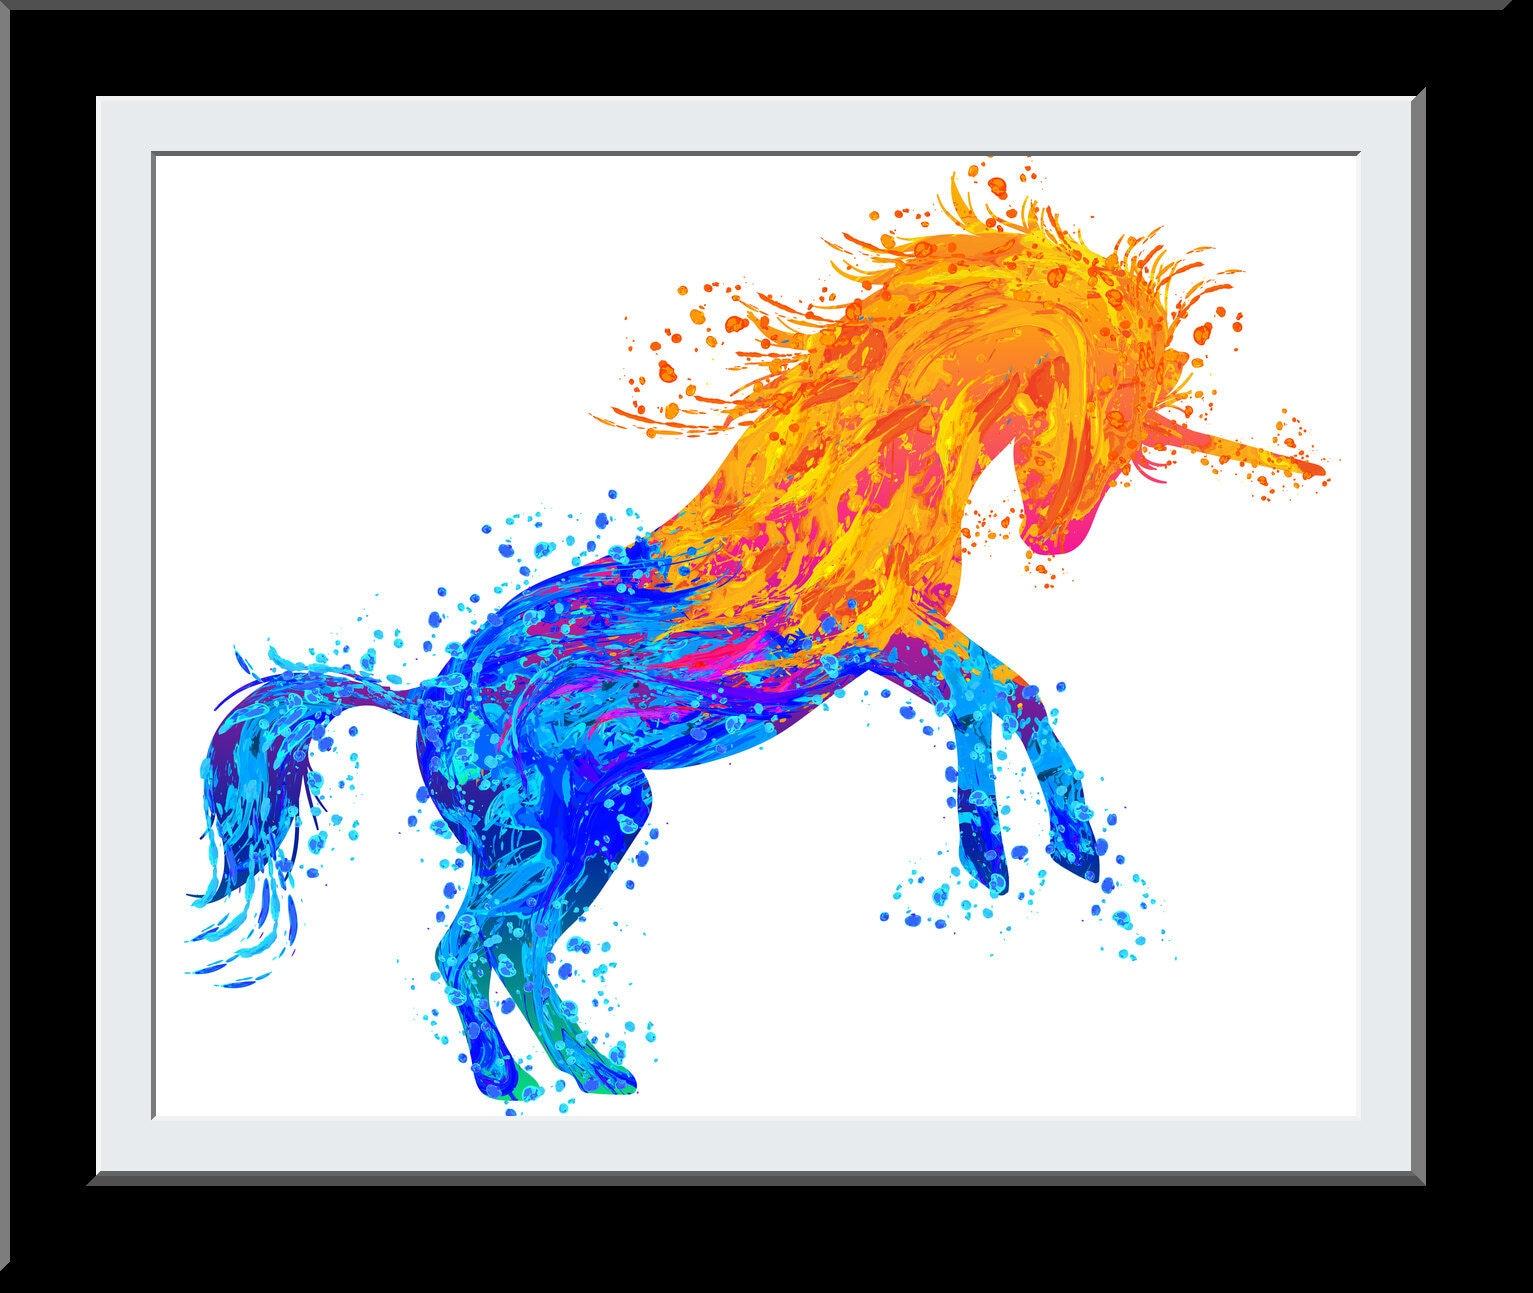 Water Color Beautiful Unicorn Gift - Unicorn WaterColor Print - Fire Water Elemental Digital Painting - Gift for Girls - Nursery Wall Art